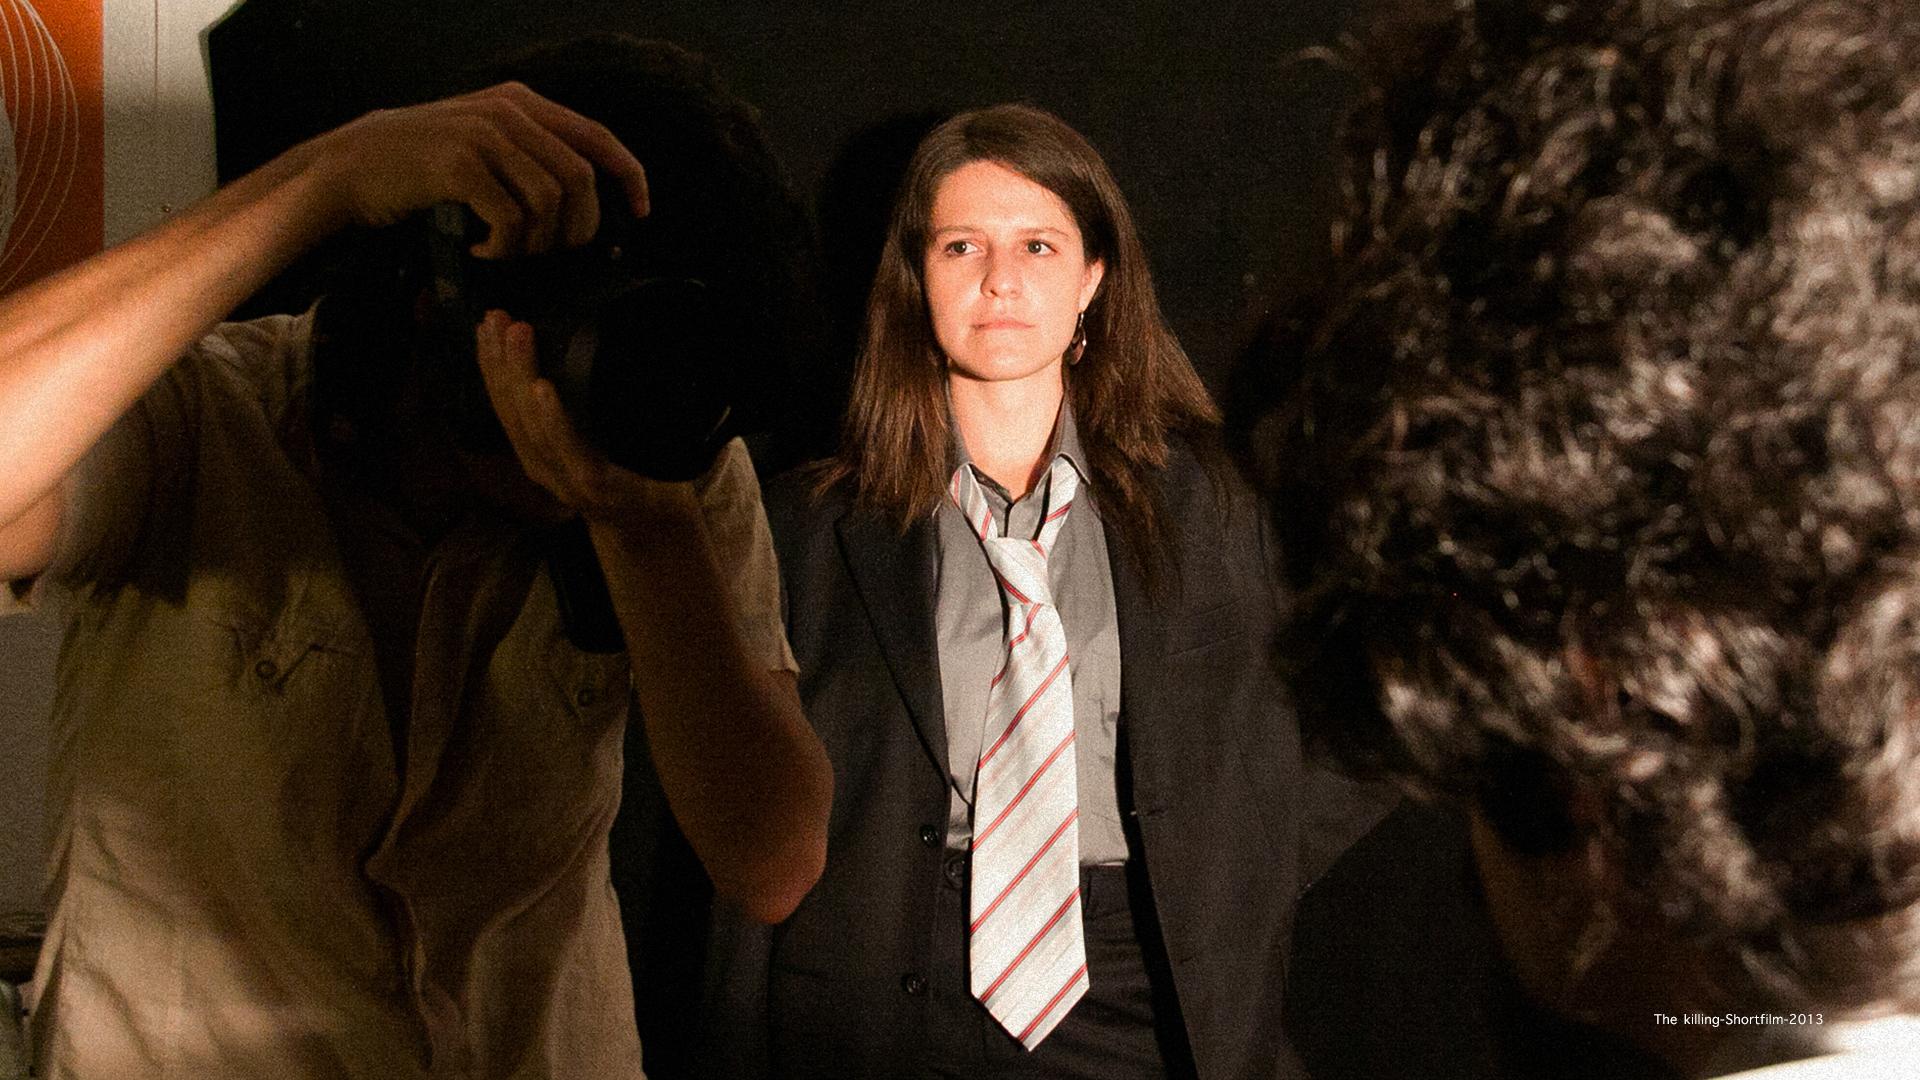 http://farhadbazyan.com/wp-content/uploads/2021/01/The-killing-Shortfilm-2013-2.jpg